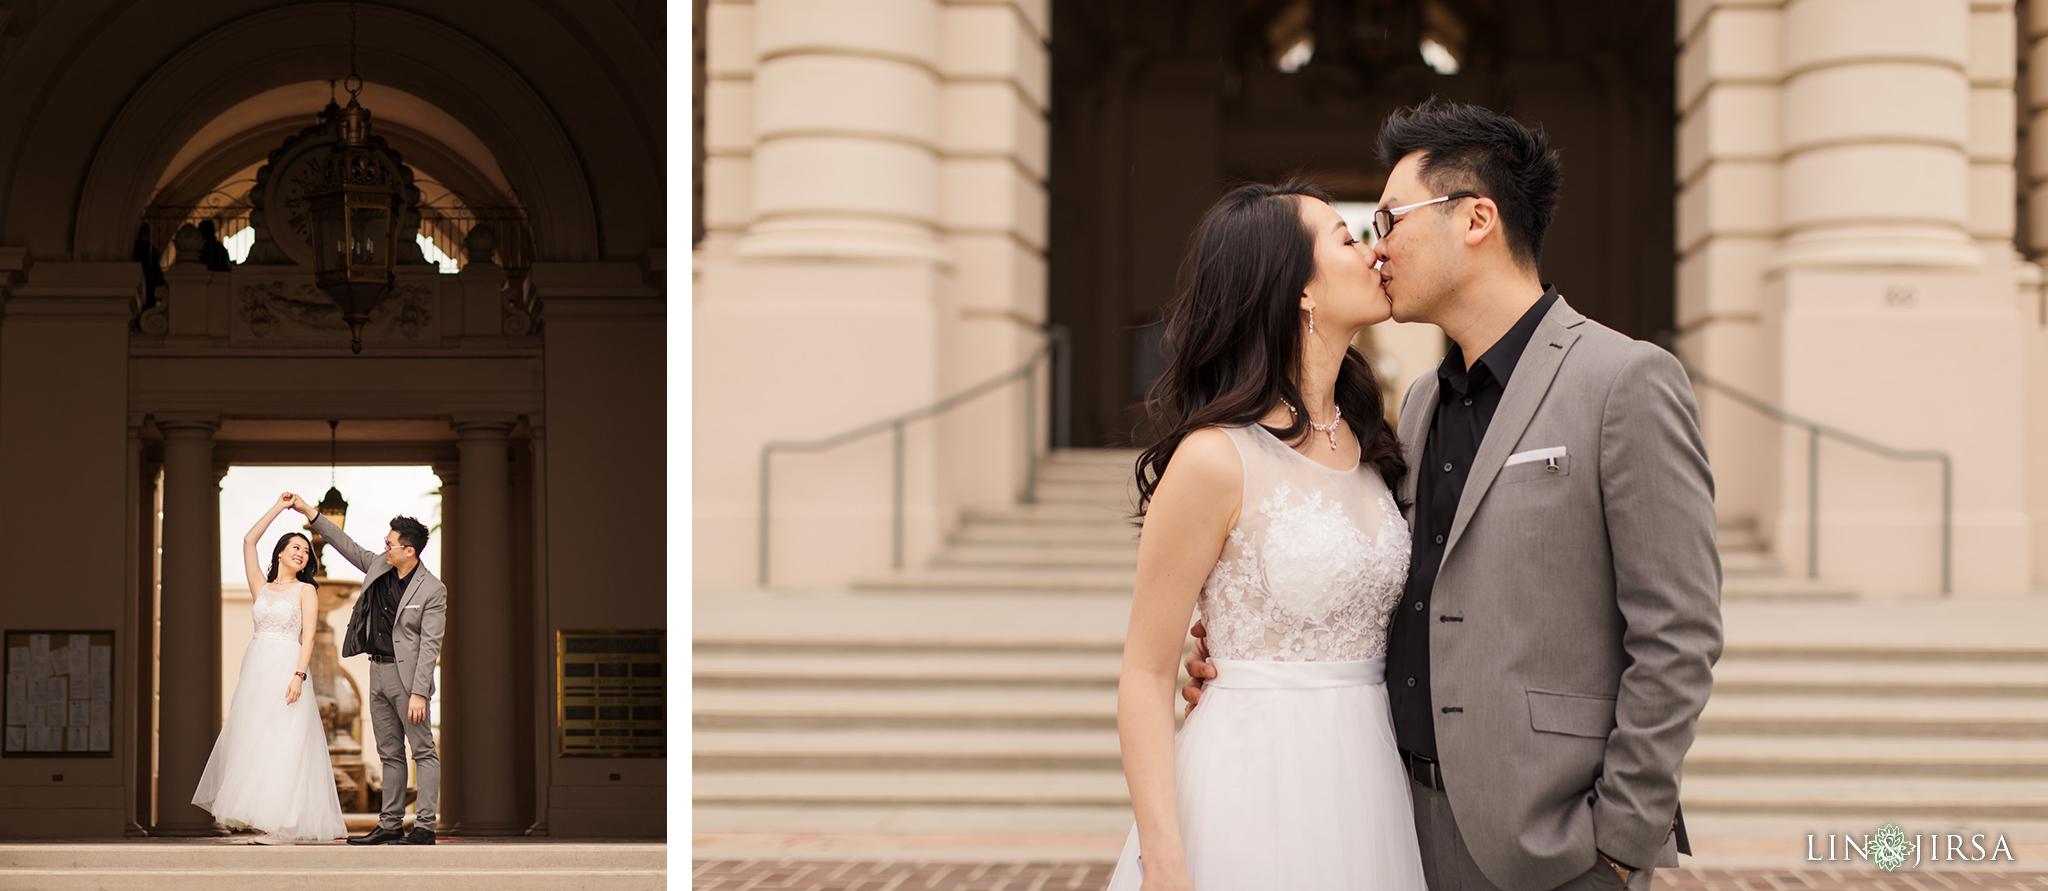 13 Pasadena City Hall Engagement Photography 1